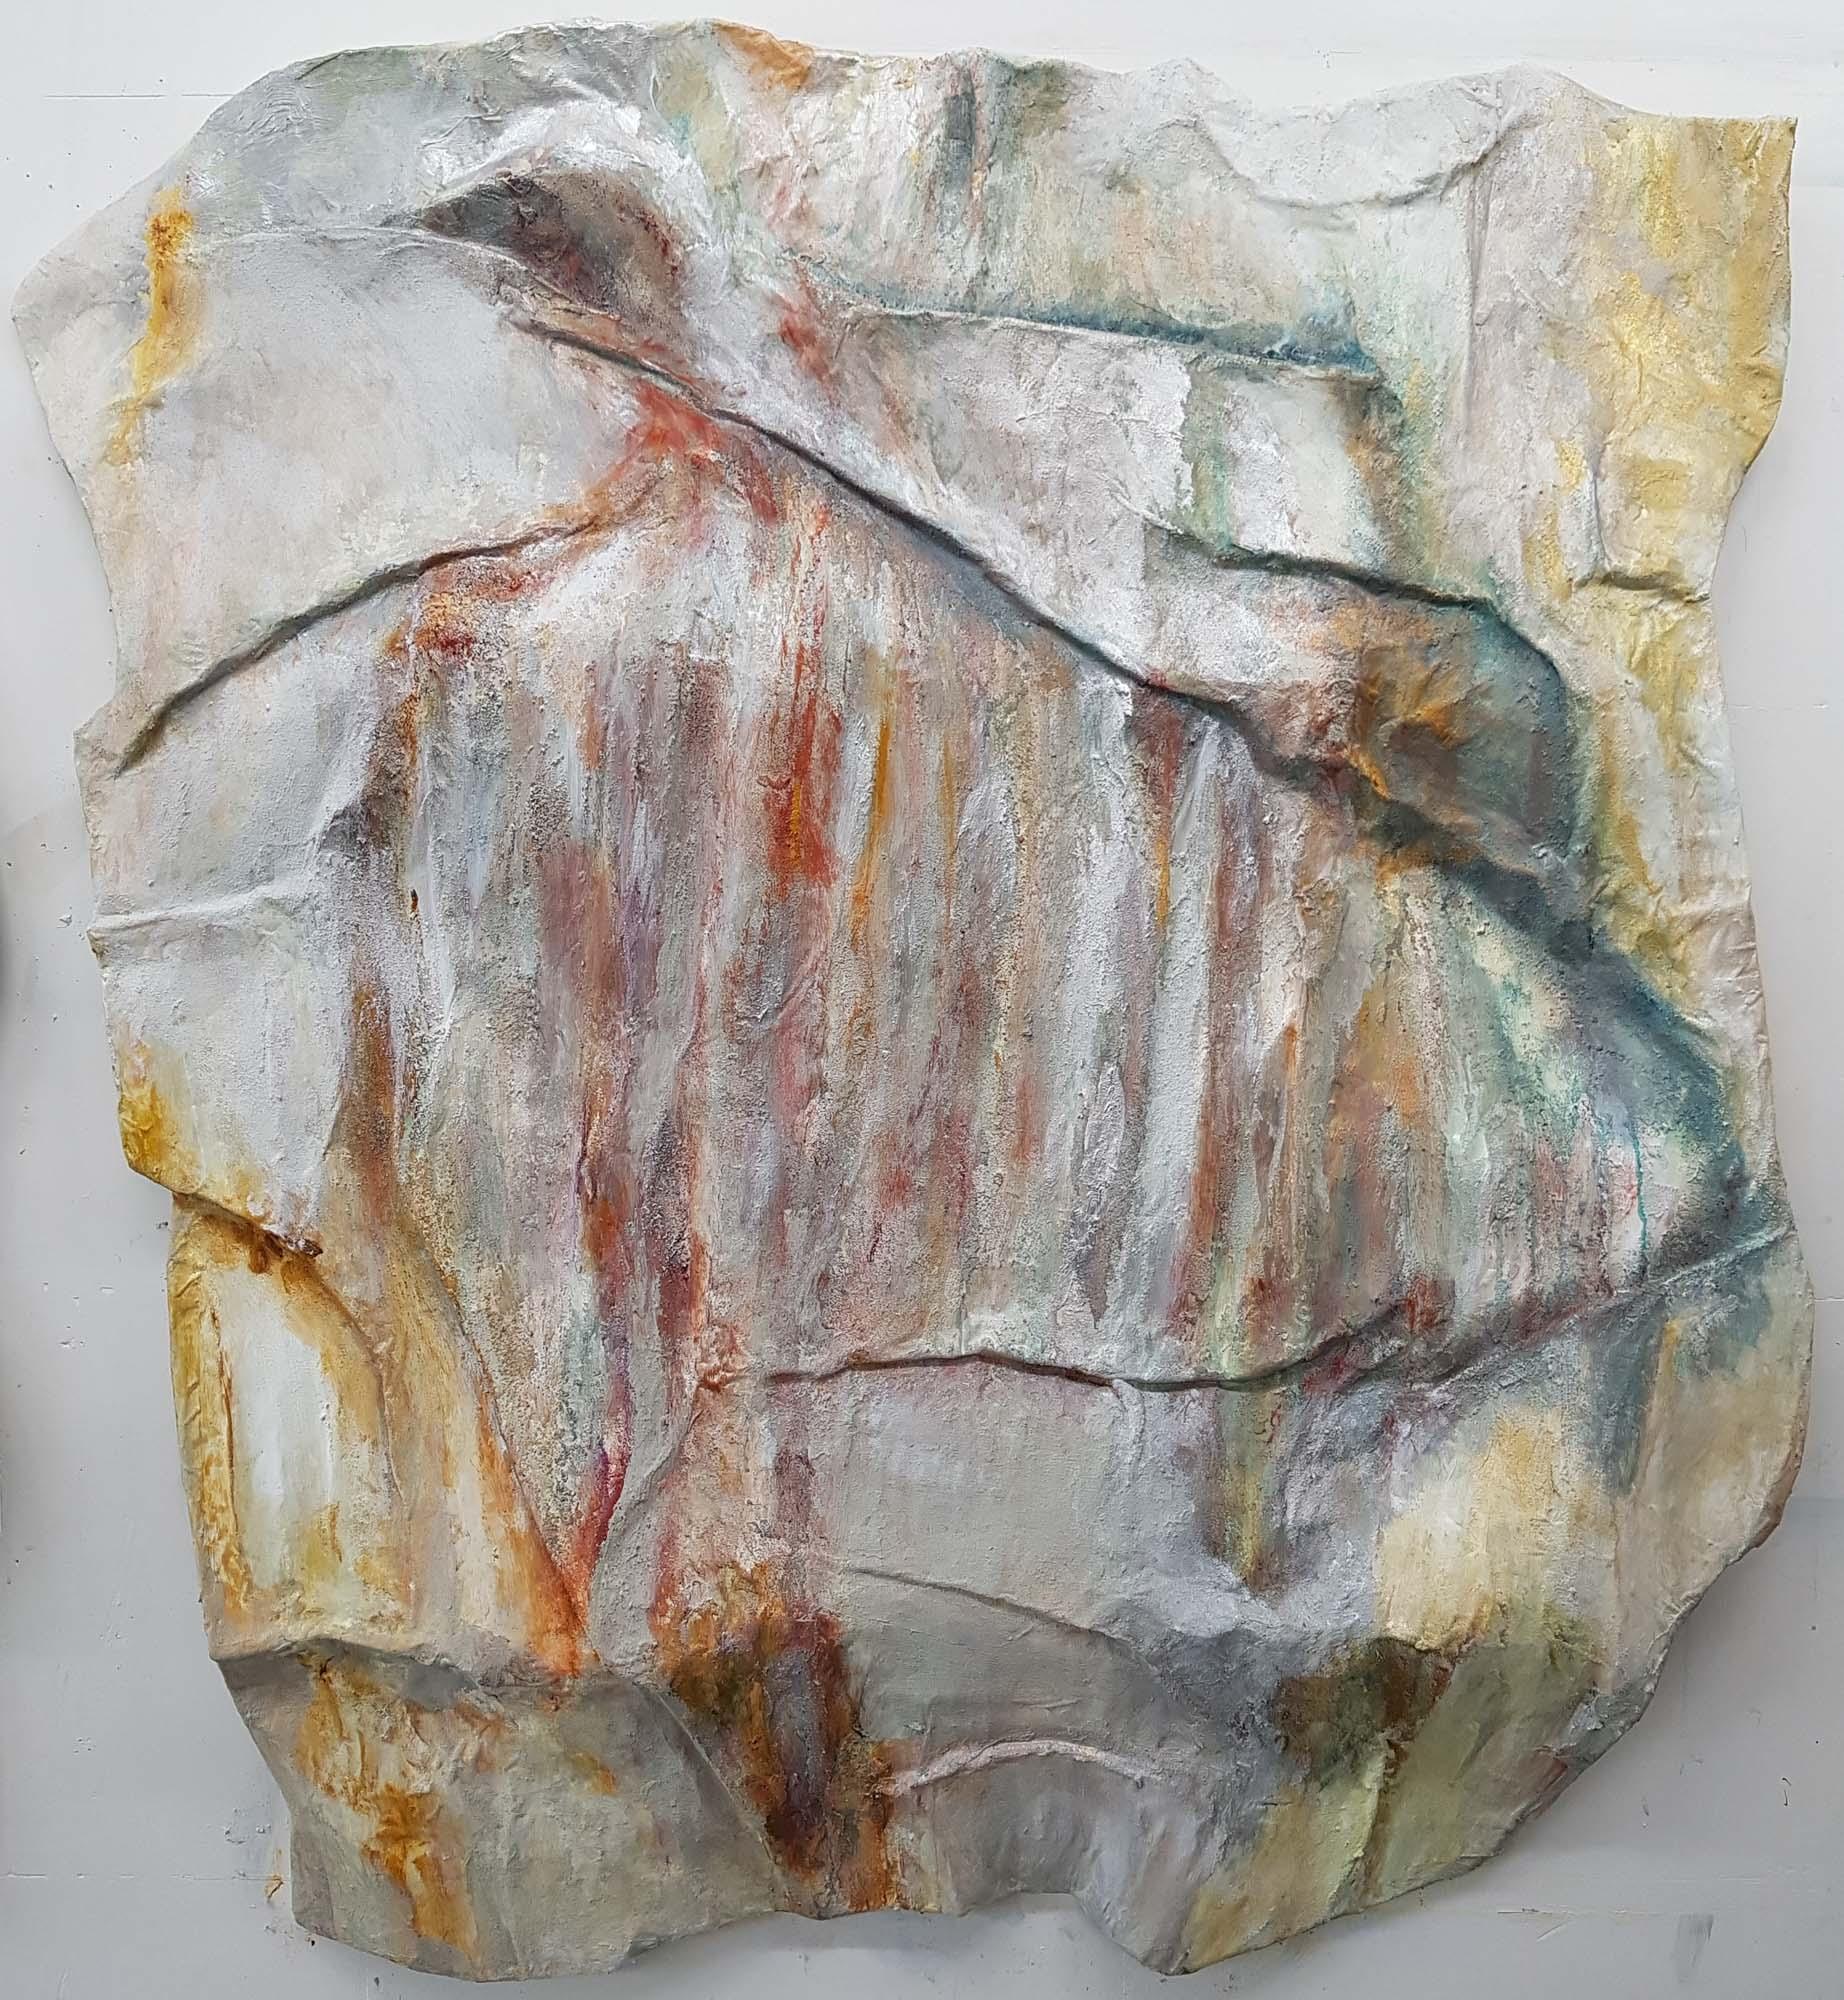 Ruissellement-162x140cm-2